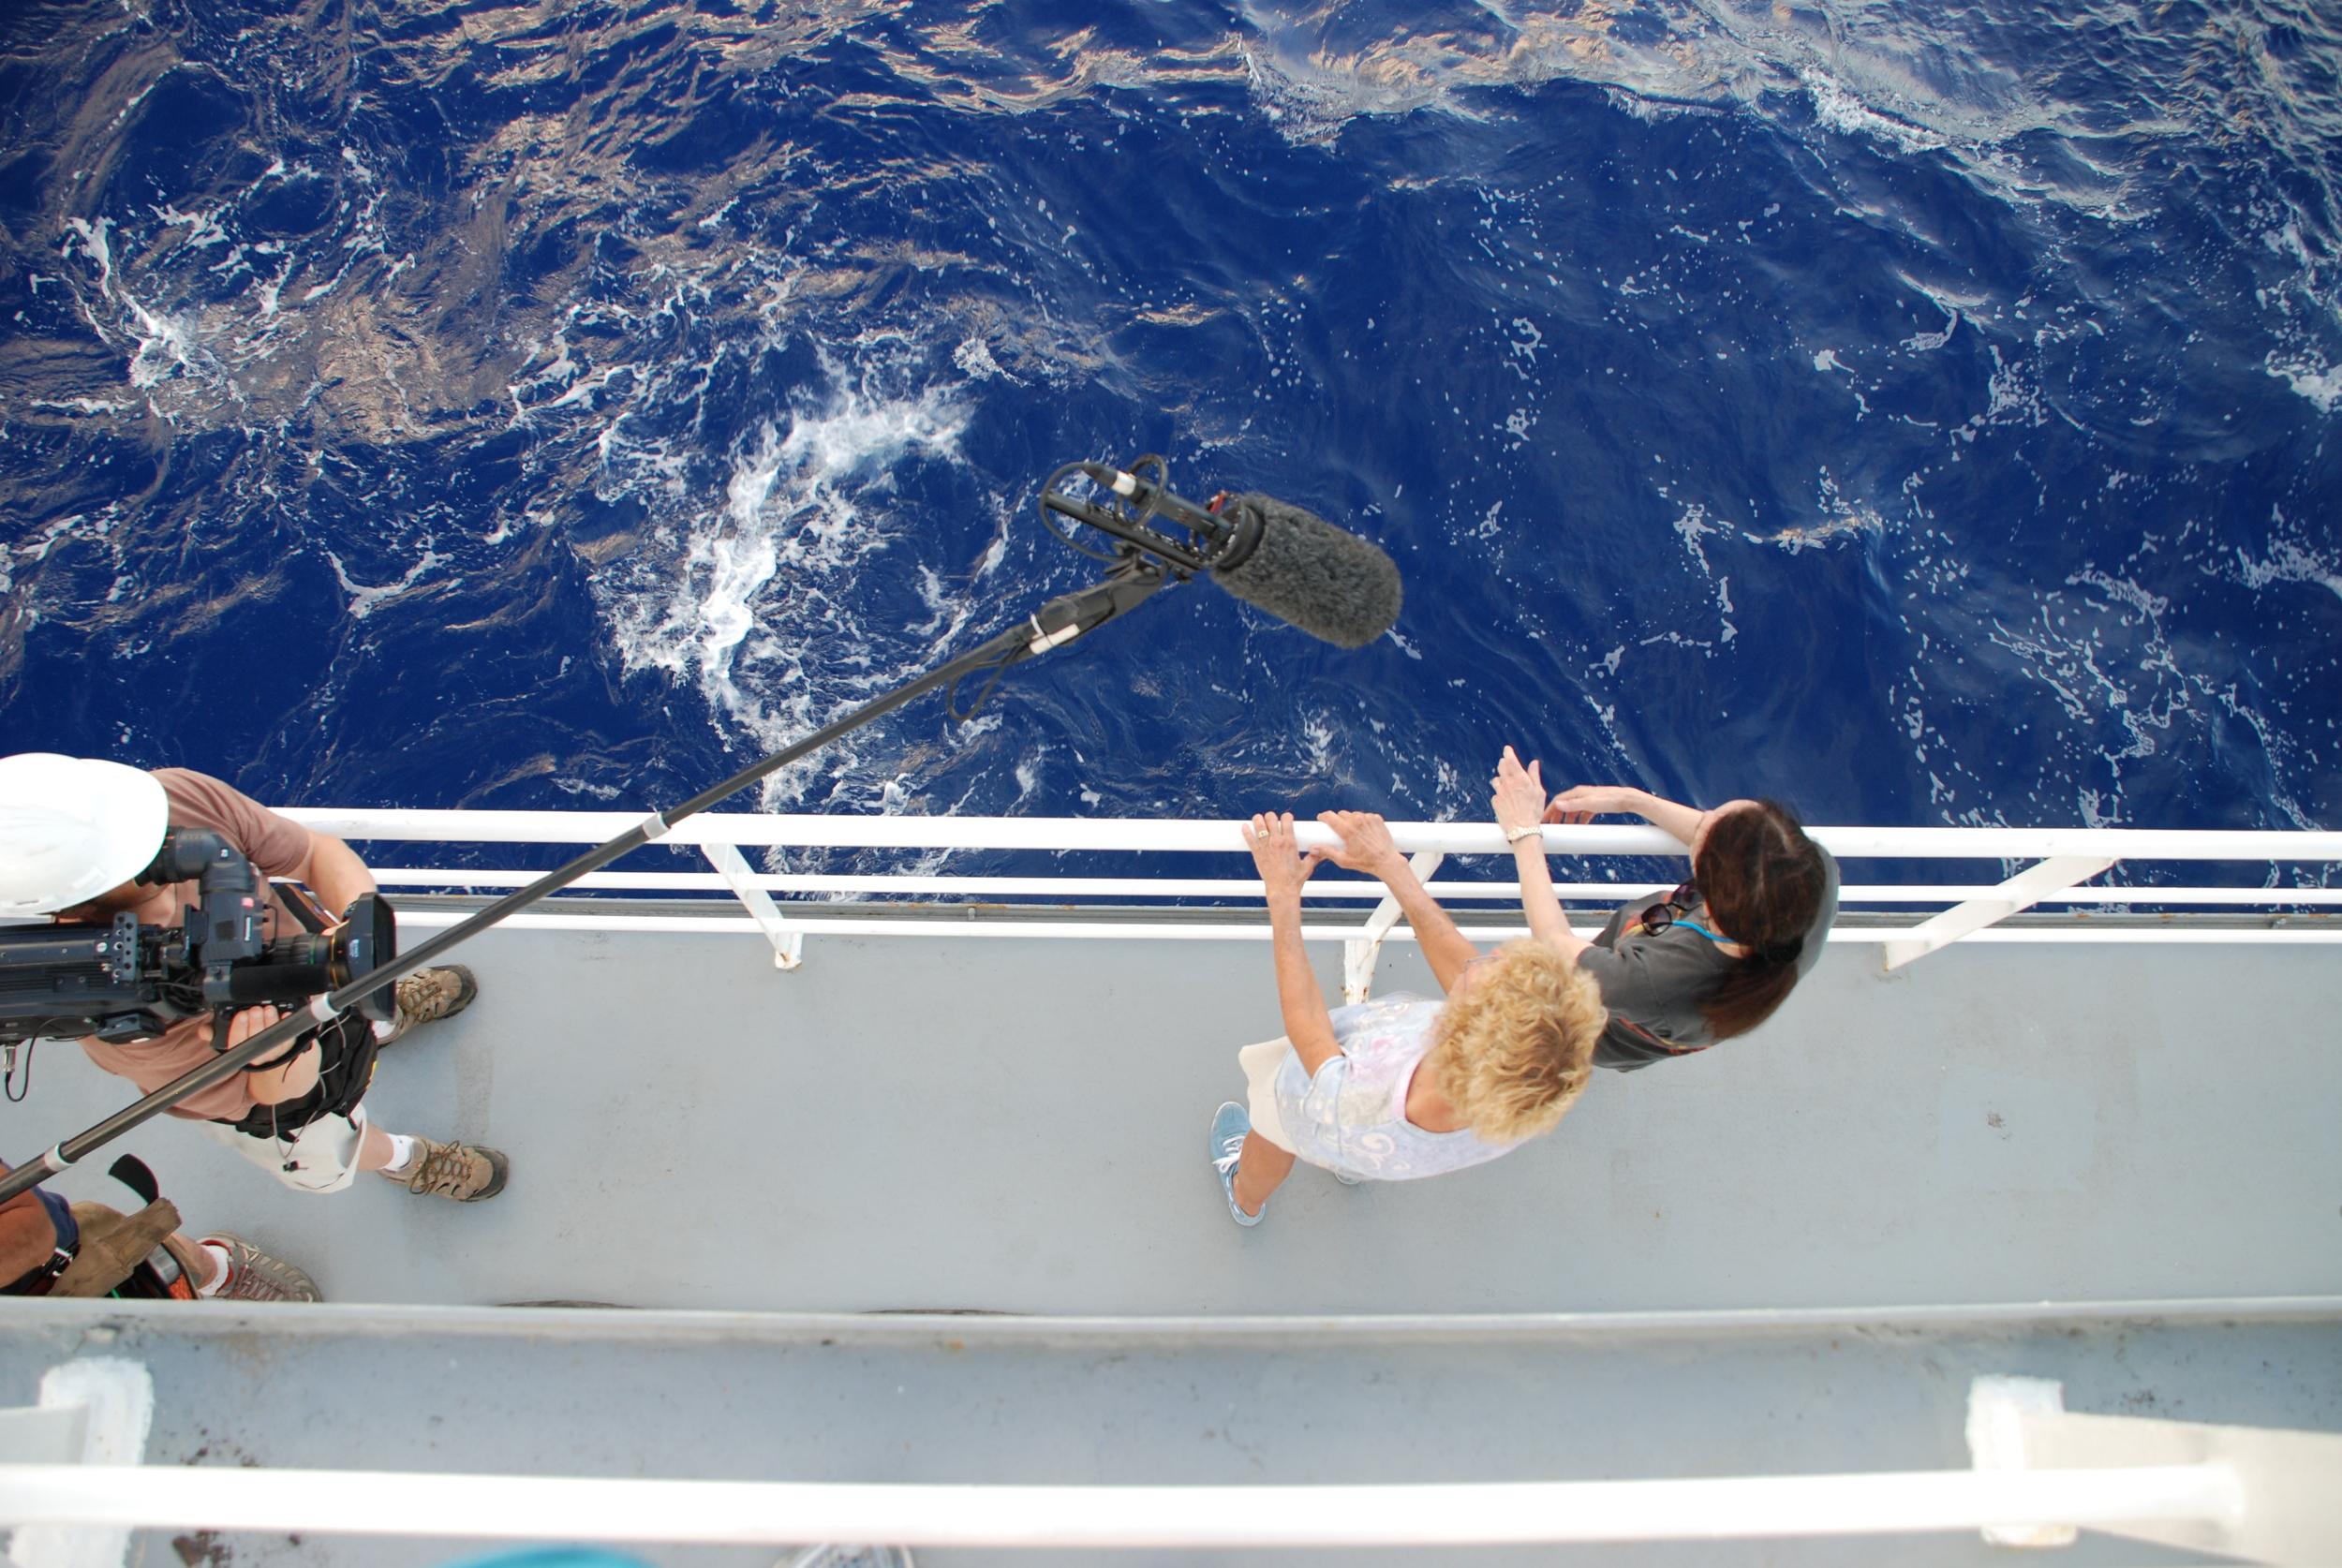 Film crews an a research cruise